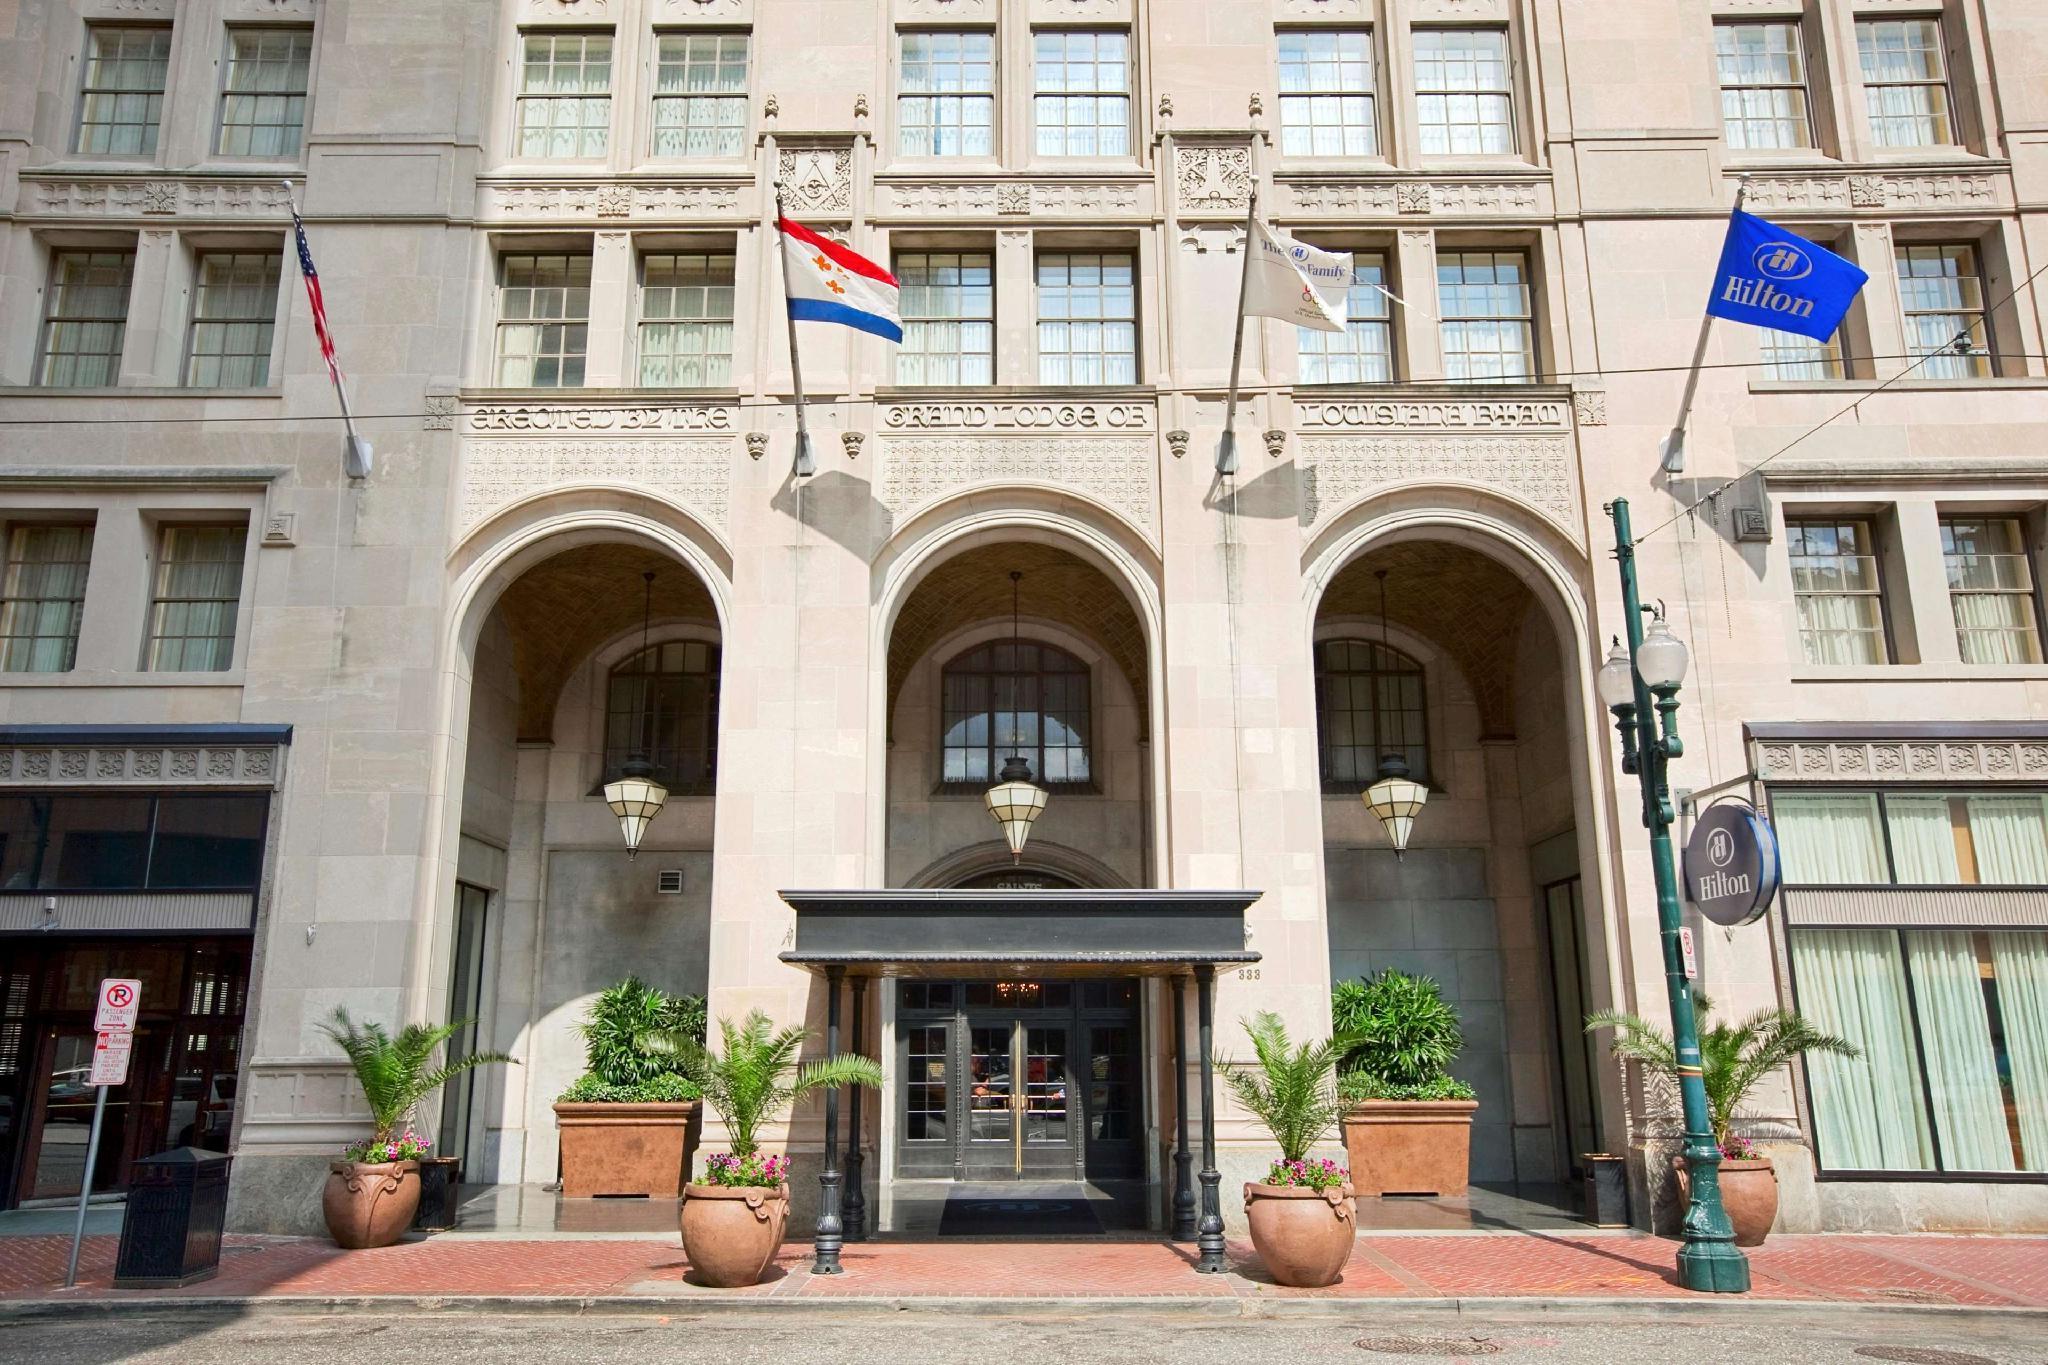 Hilton New Orleans St Charles Avenue Hotel